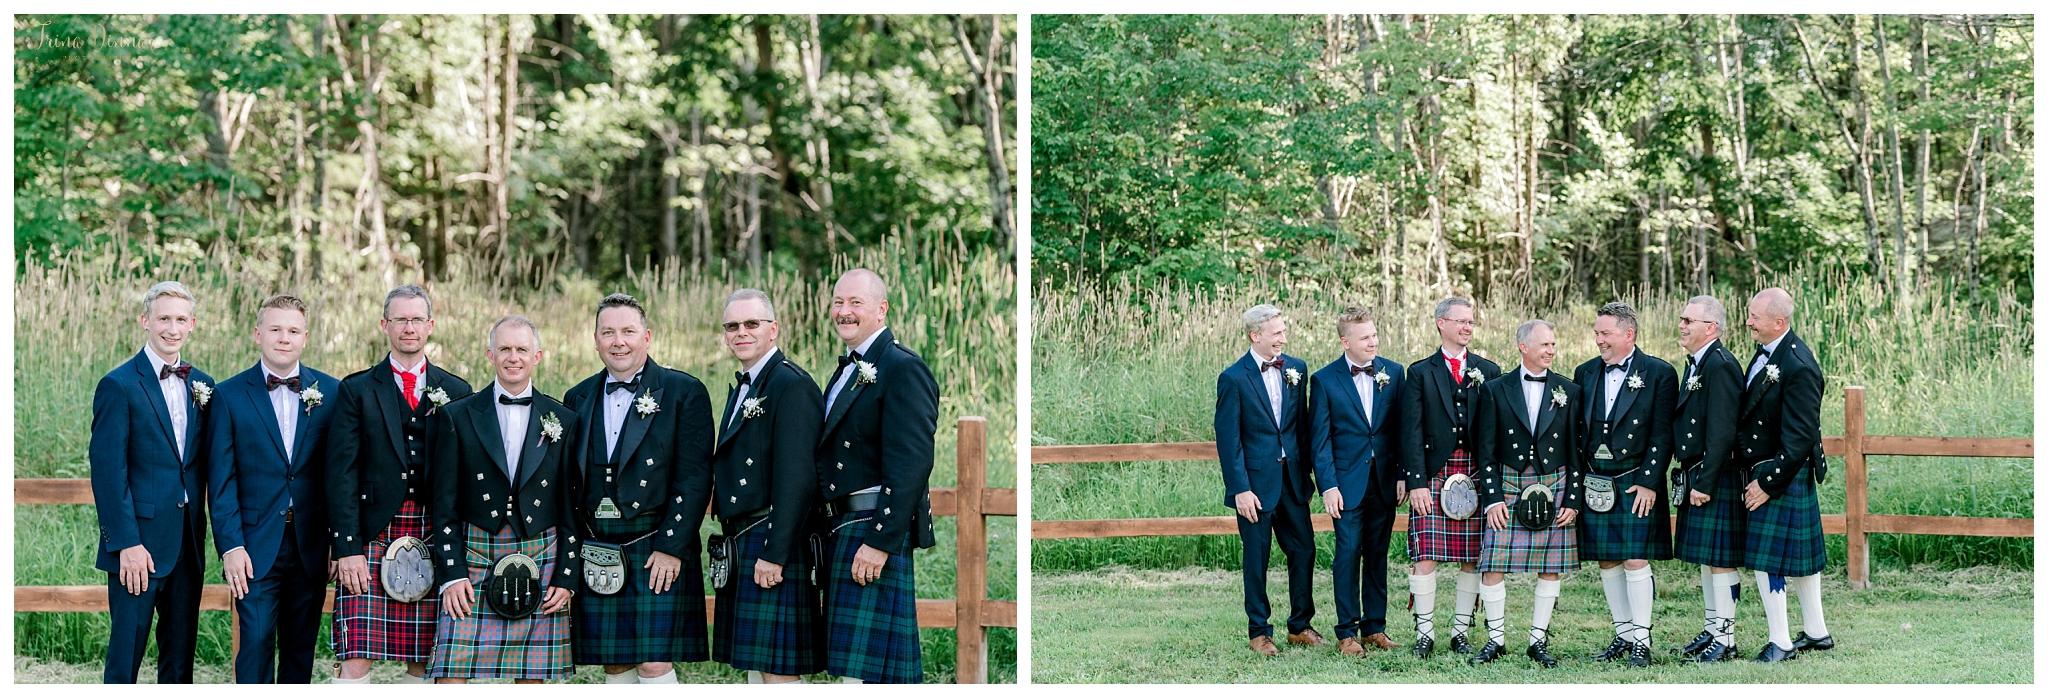 Scottish American Groom and Groomsmen Portraits